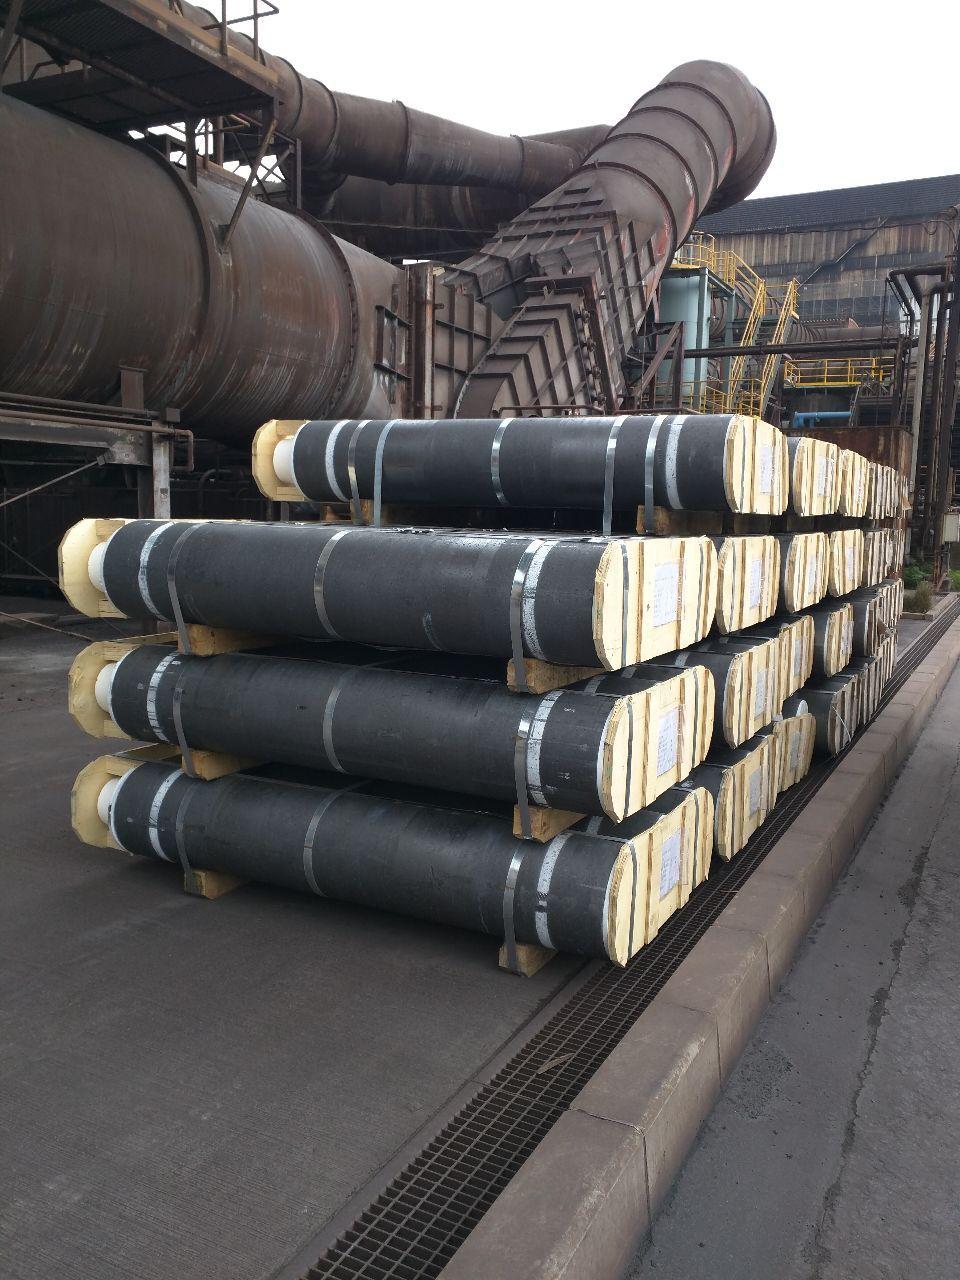 5304 - SECカーボン(株) これら黒煙電極全てMade in China 中国はもう自国で十分製造出来てるし日本の製鉄所は原価の